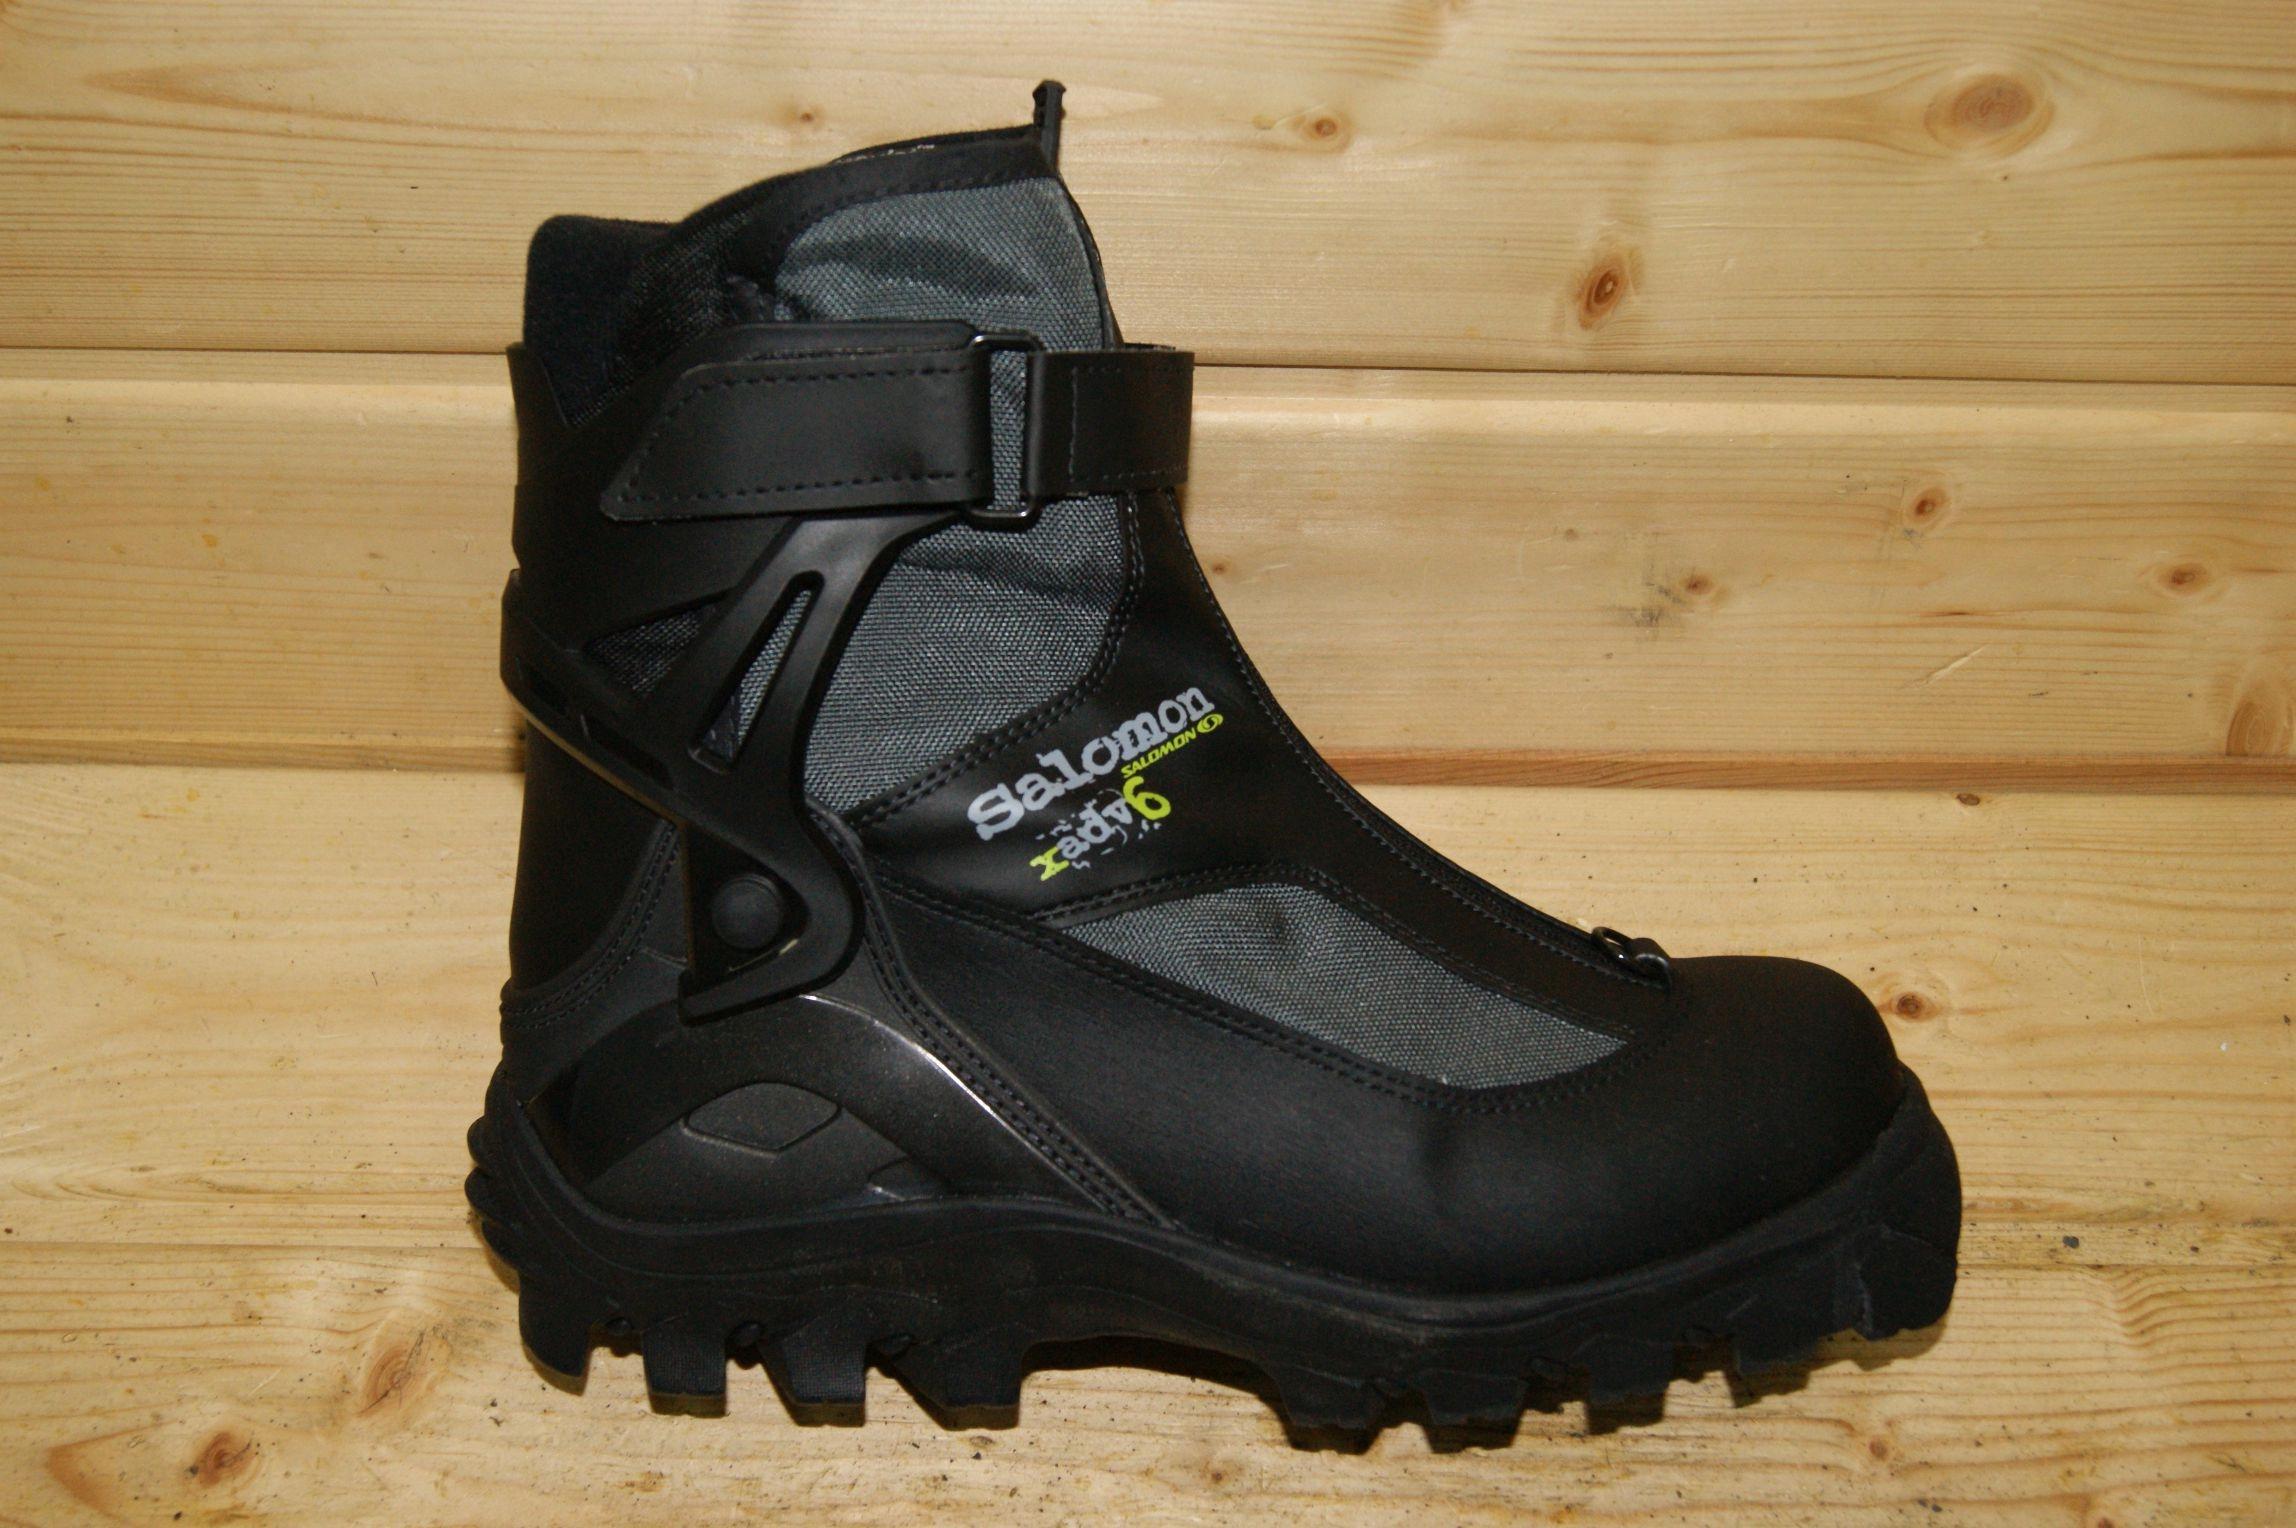 Buty biegowe SALOMON BC X-ADV 6 r.29 cm EU45 1/3